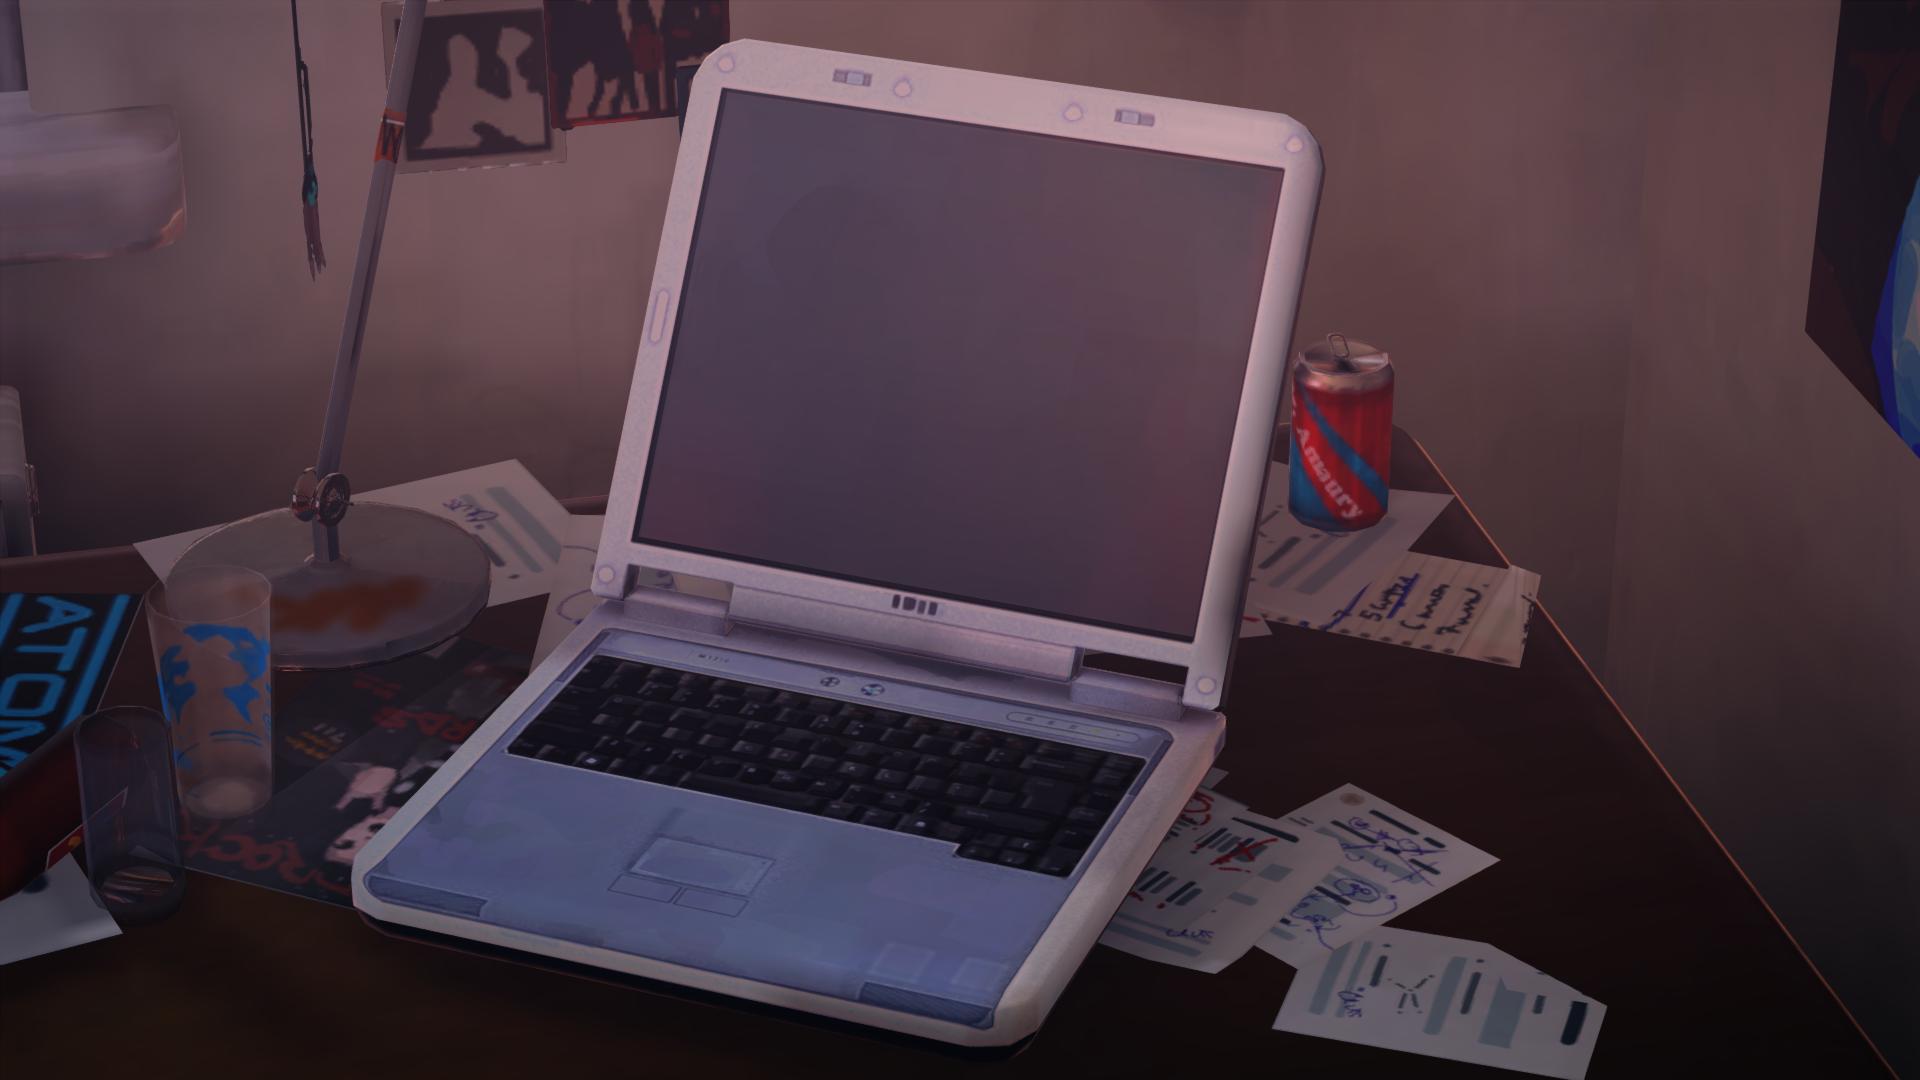 Original & Chloeu0027s Computer | Life is Strange Wiki | FANDOM powered by Wikia